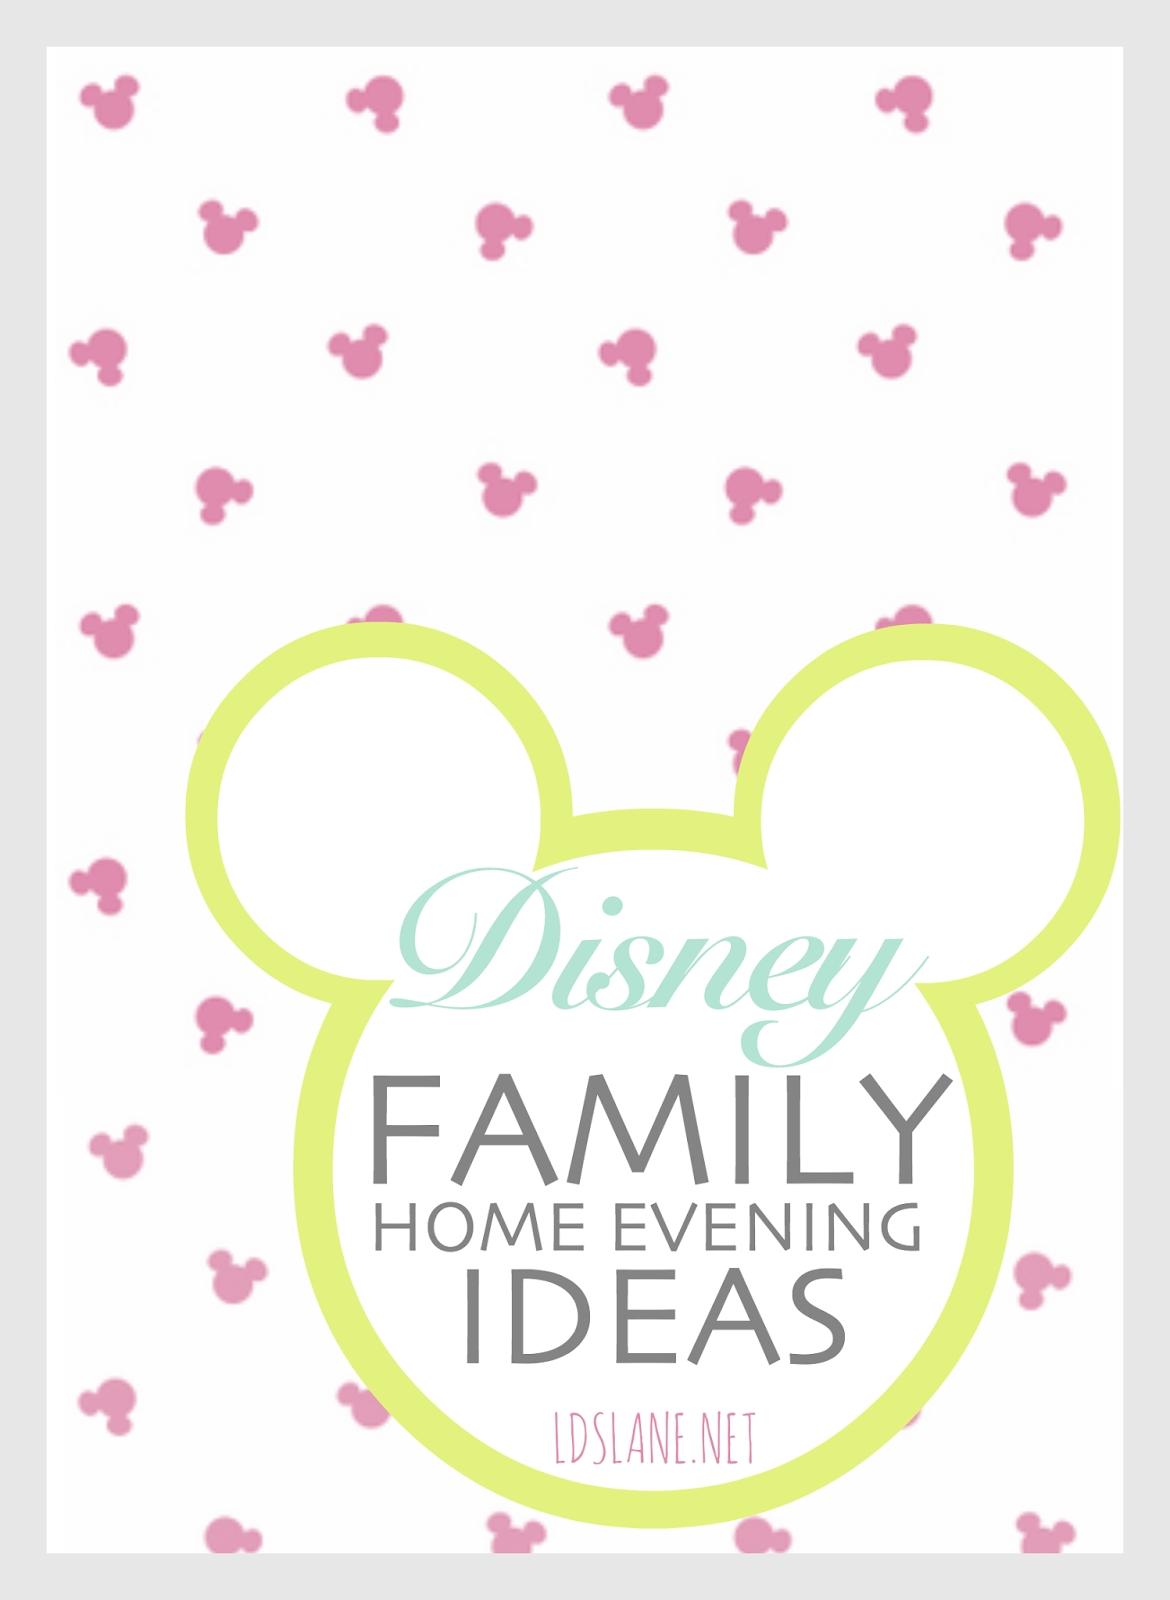 10 ideal fun family home evening ideas